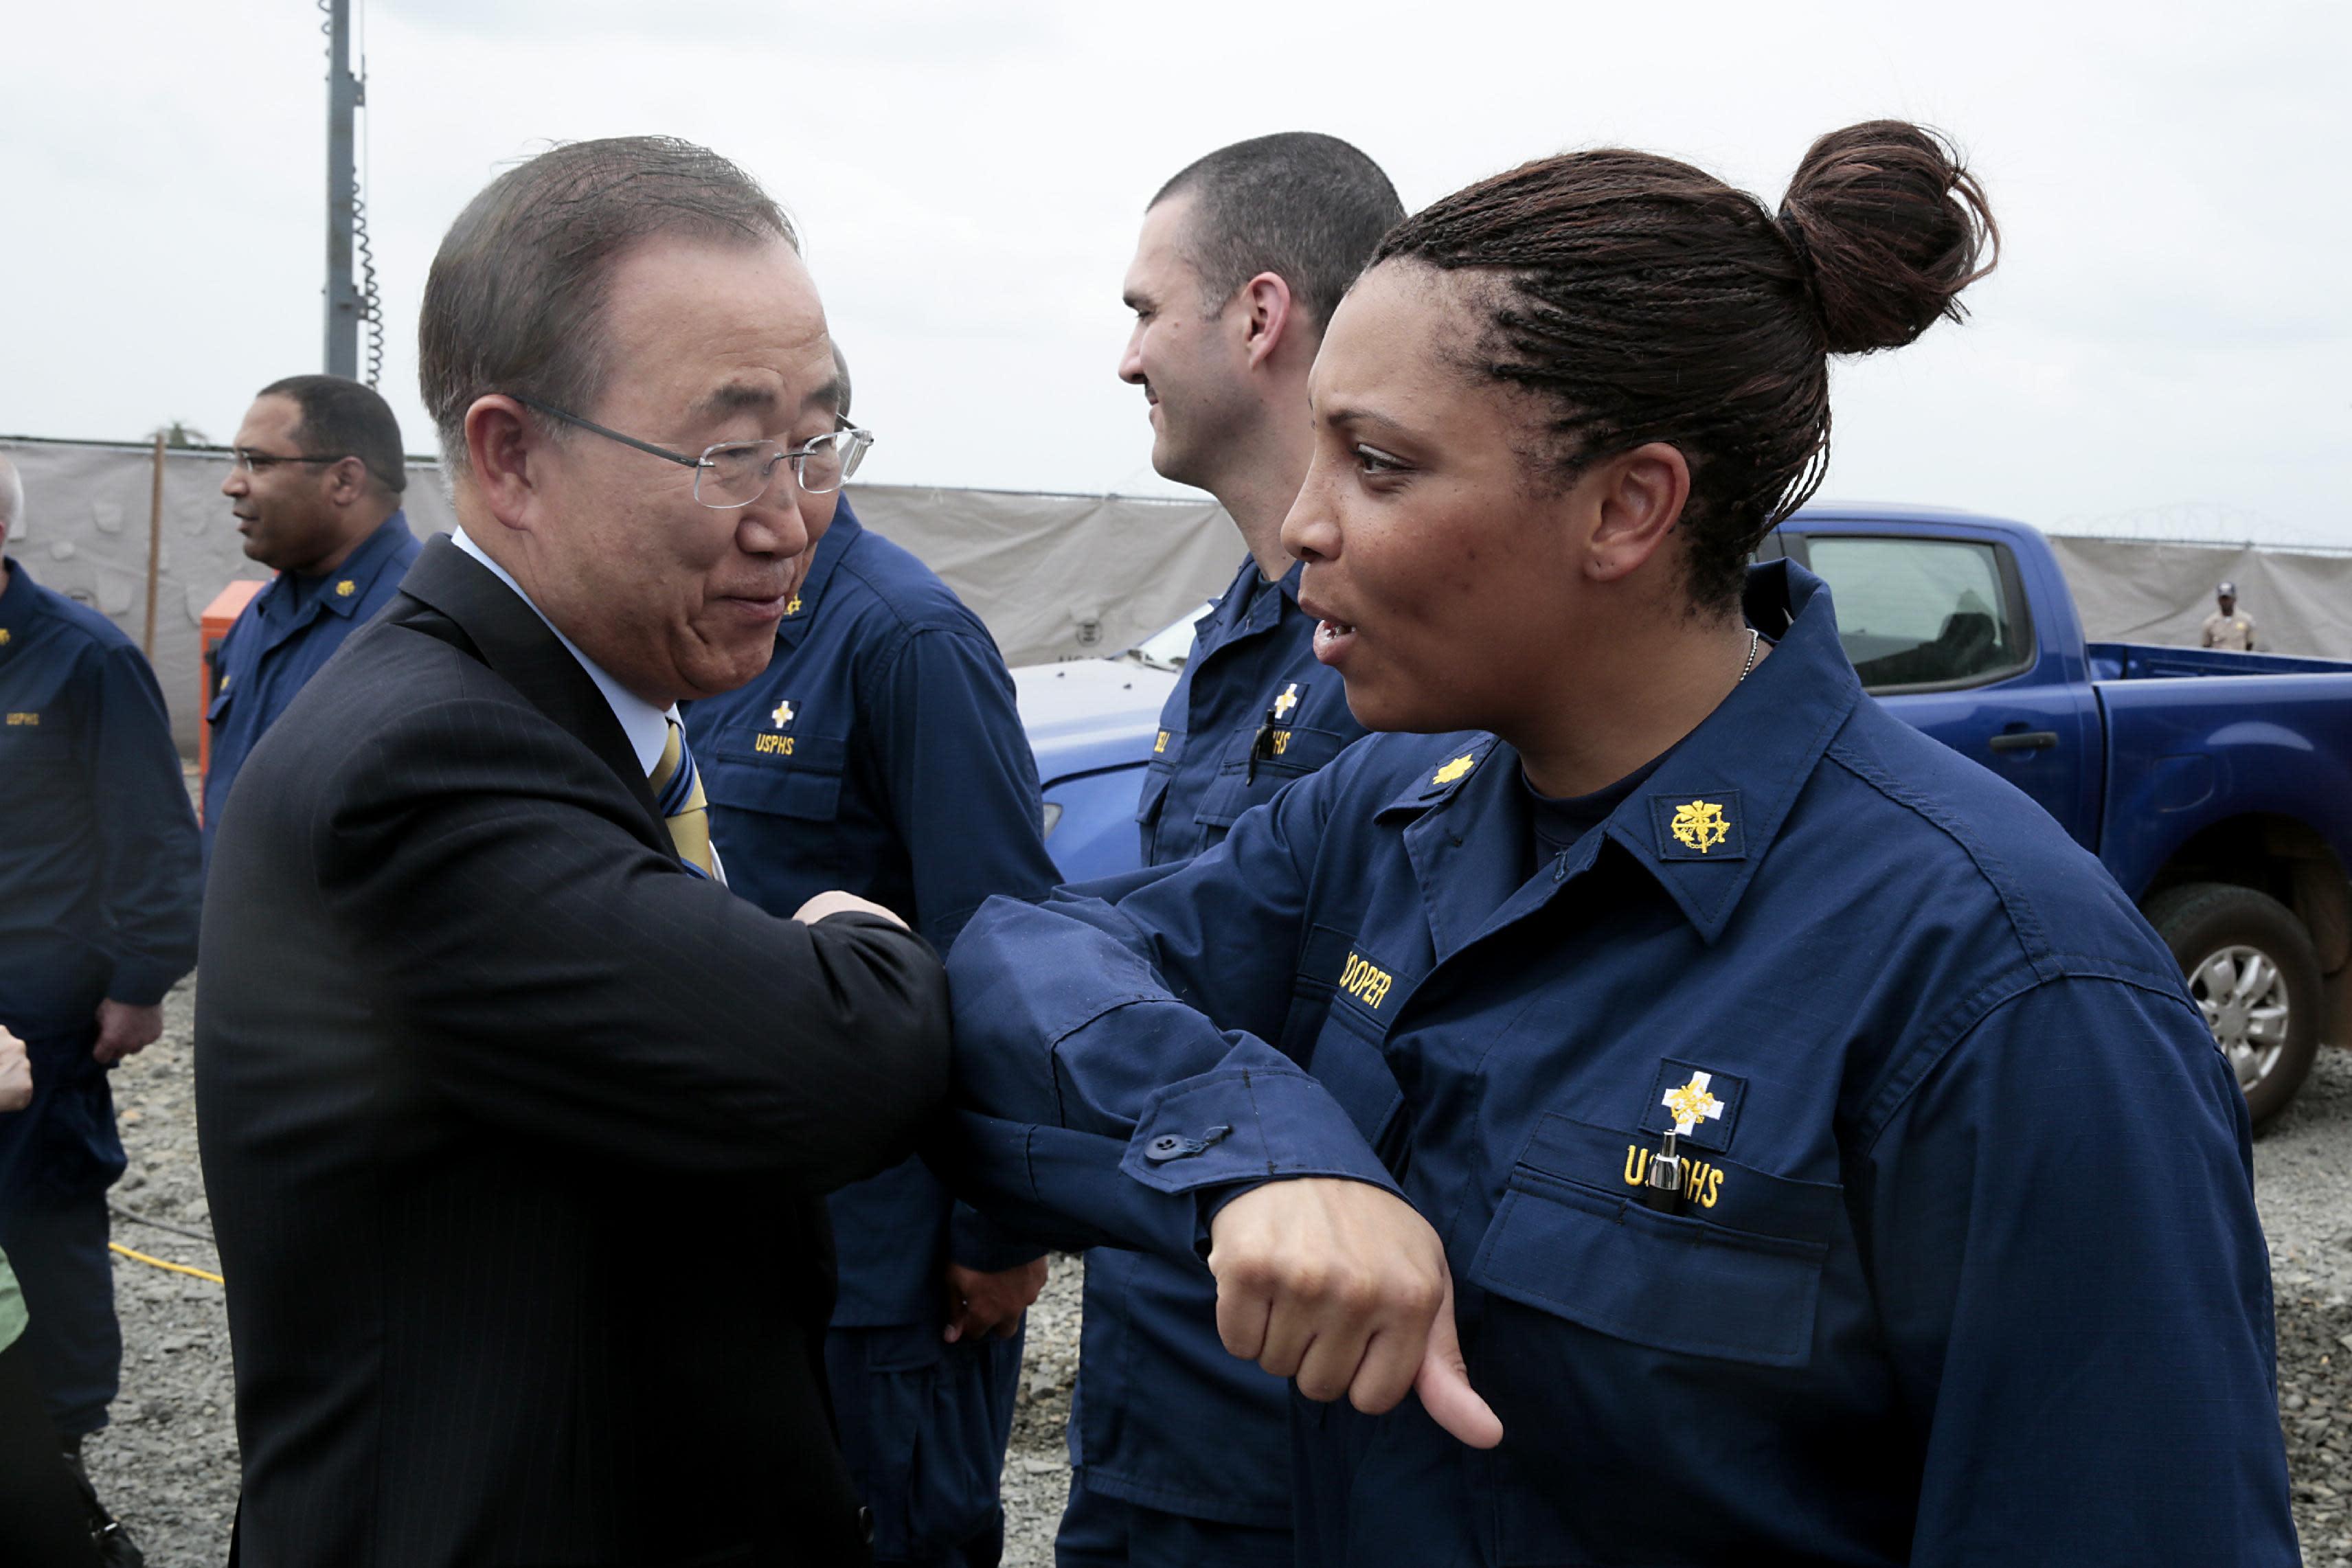 UN chief Ban Ki-moon greets a member of a medical unit on December 19, 2014 in Monrovia (AFP Photo/Evan Schneider)